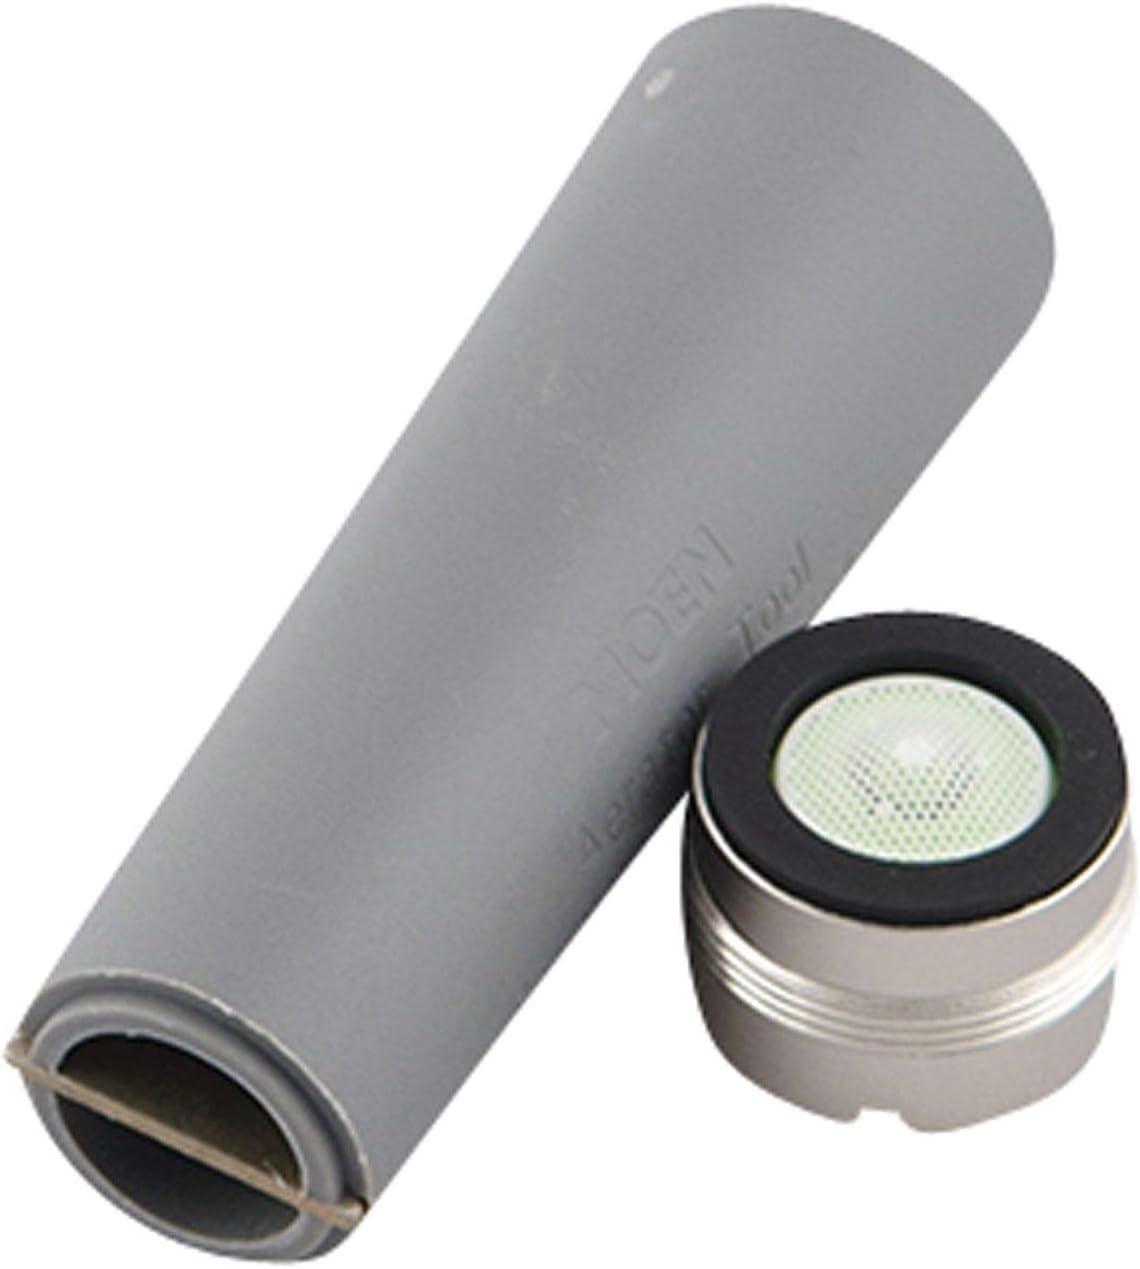 Moen 52016 Vandal Proof Aerator Tools Products Amazon Com